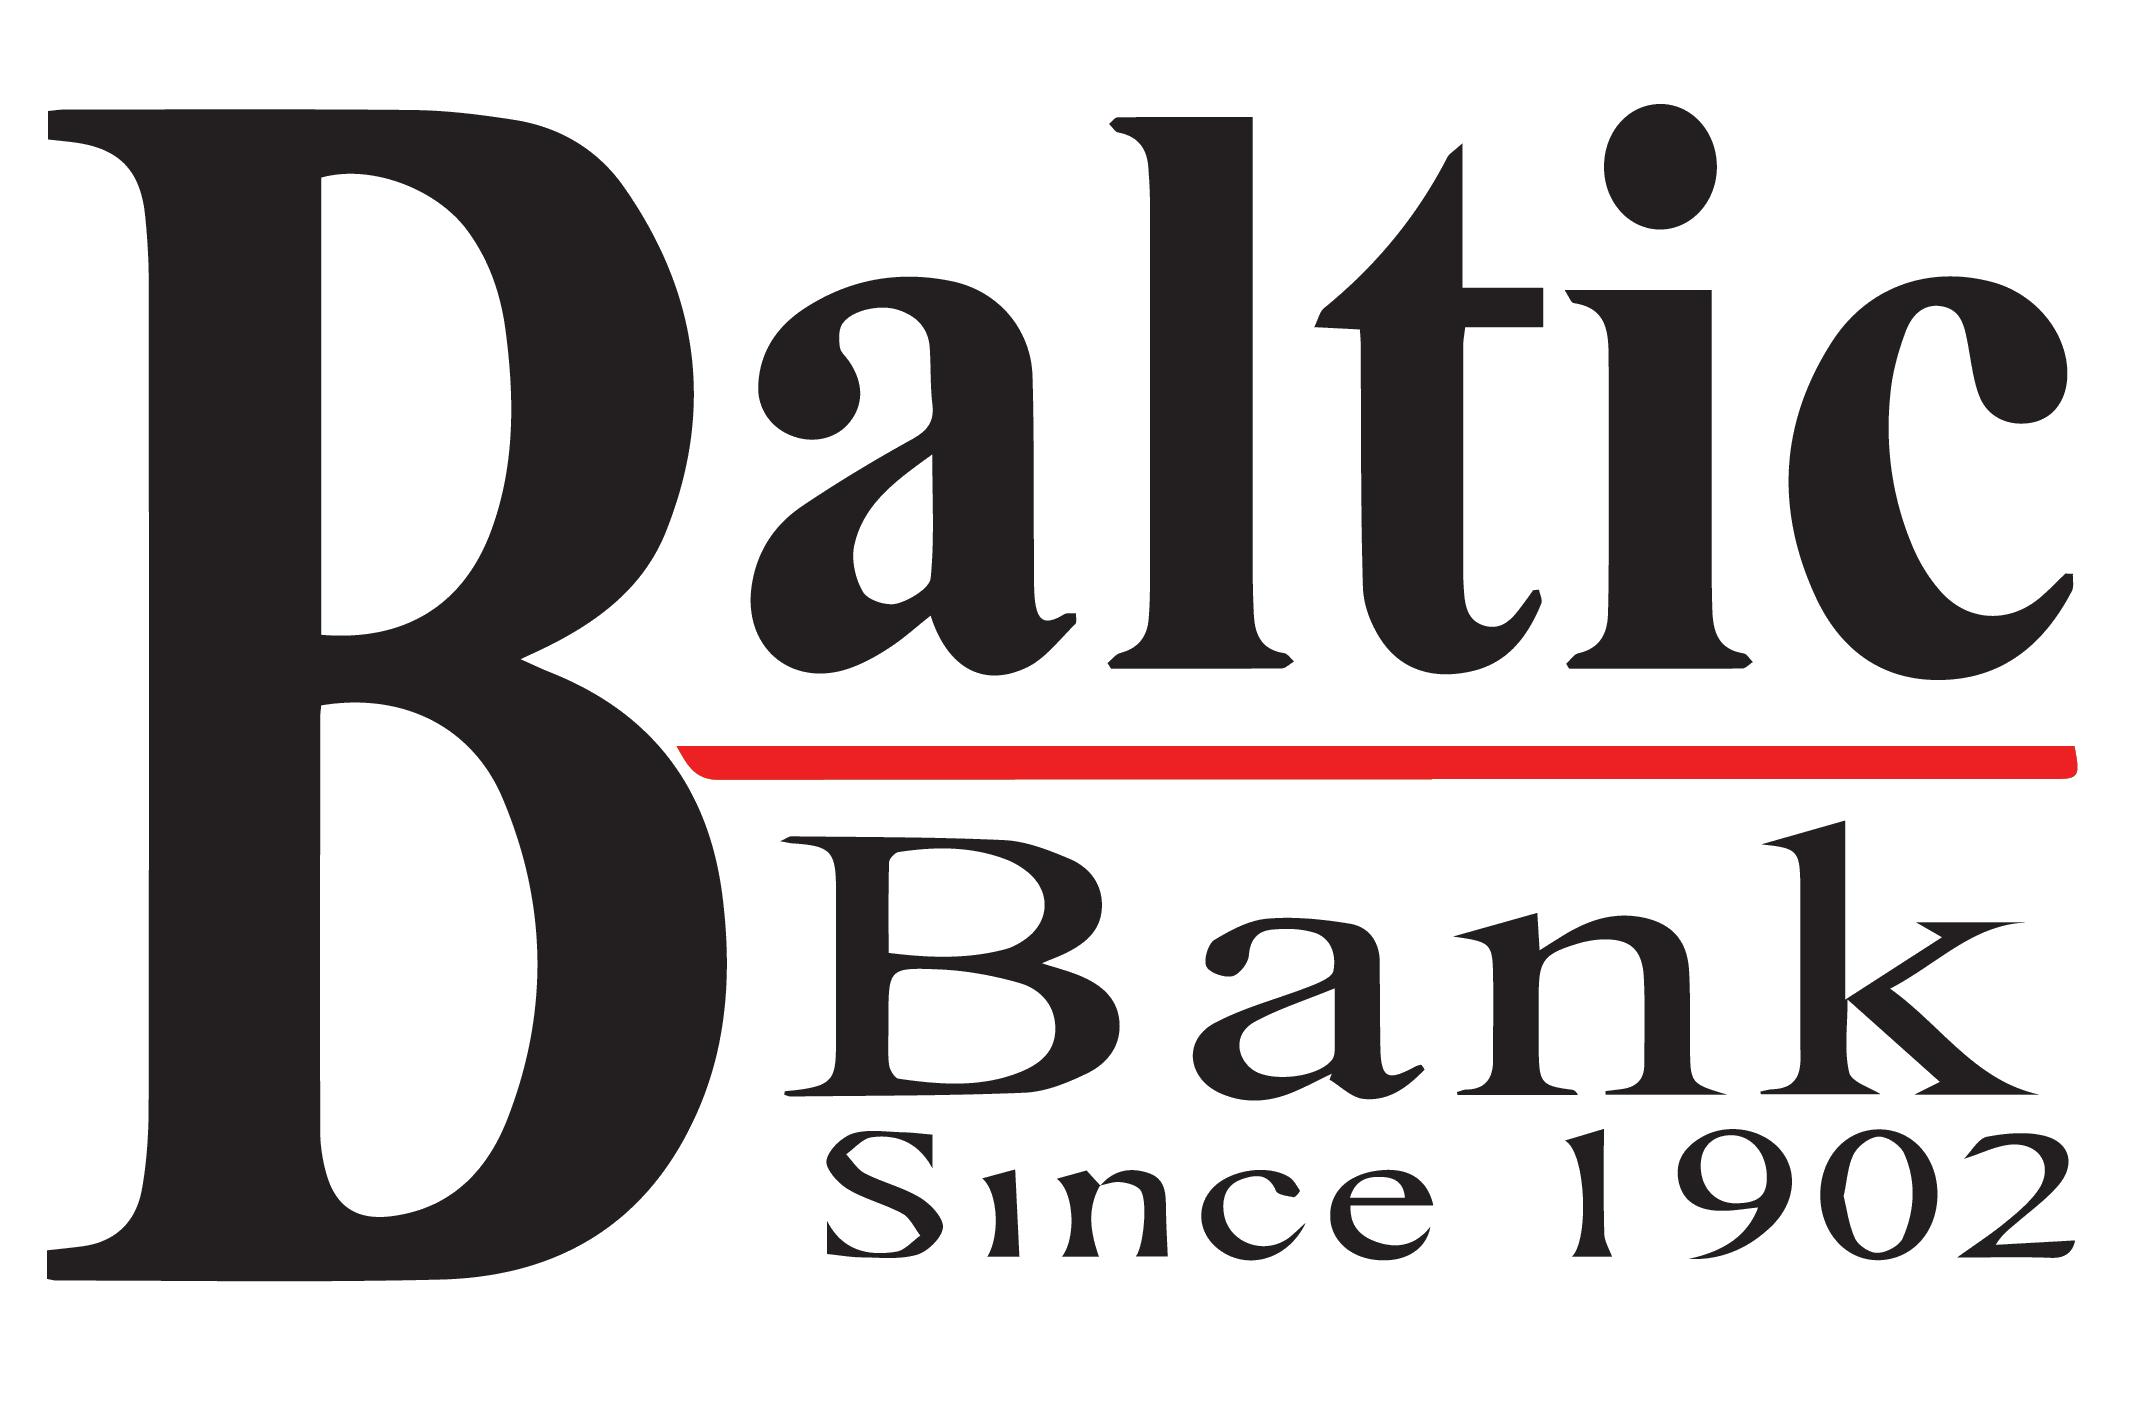 Visit Baltic Bank's website